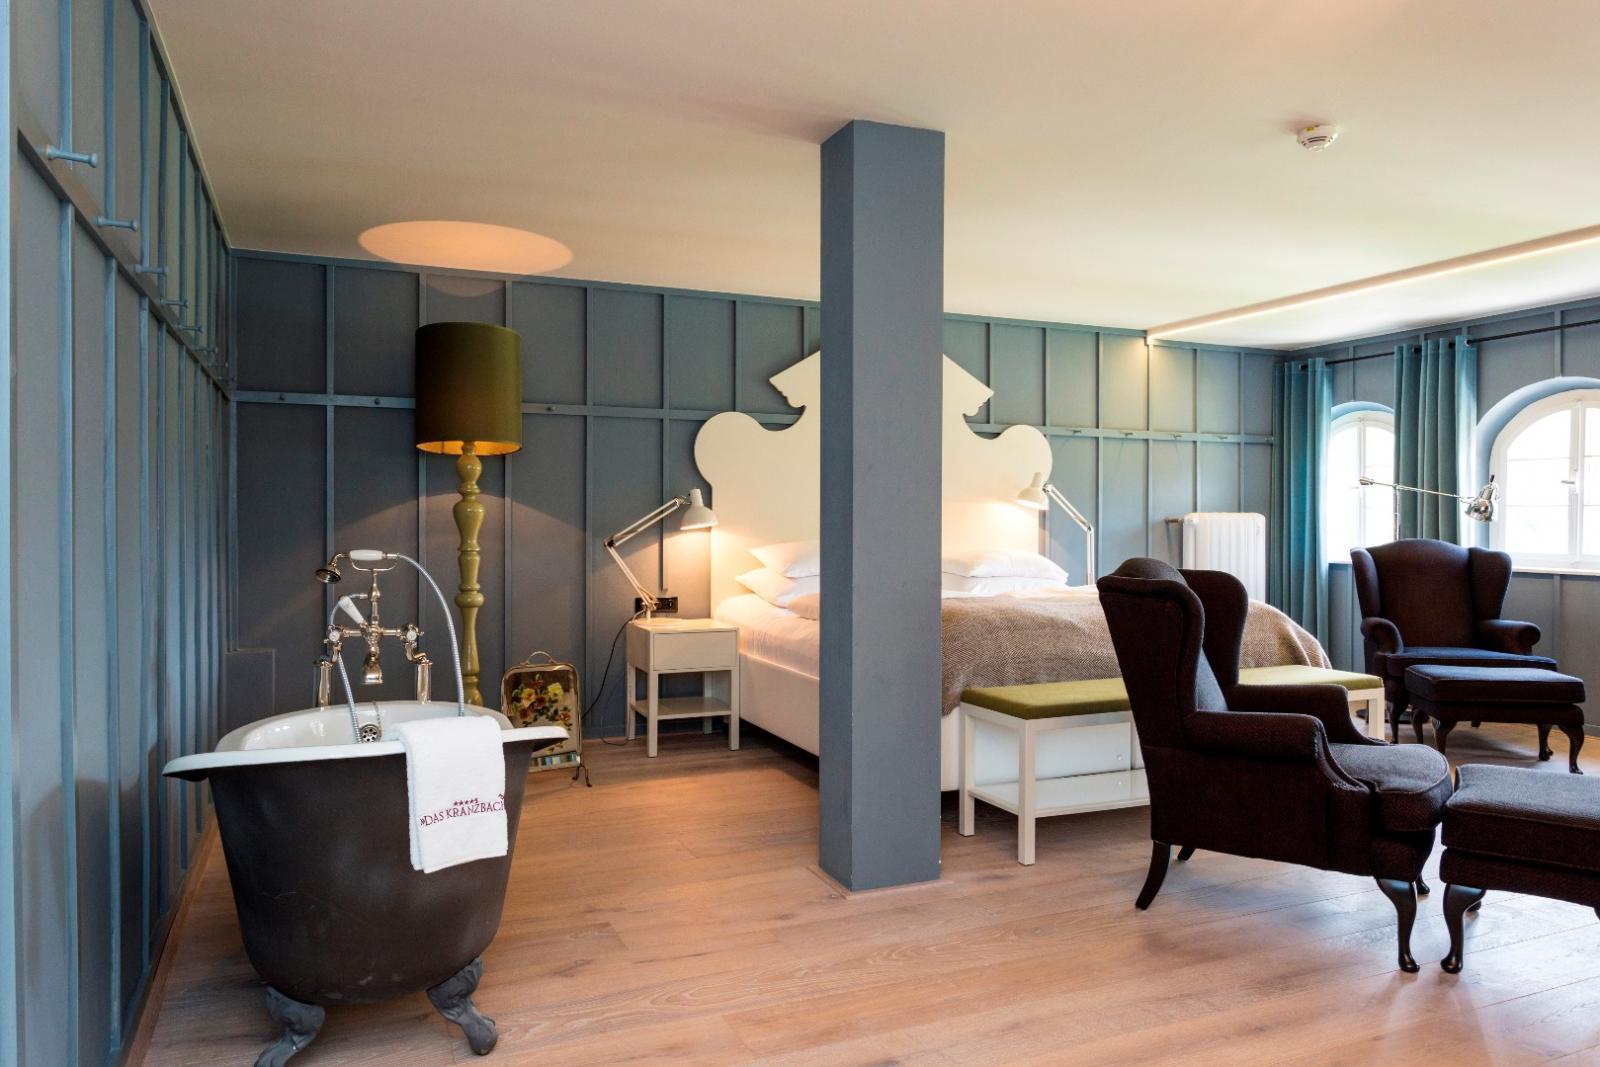 Beauty: Foto vom Wellnesshotel »DAS KRANZBACH« Hotel & Wellness-Refugium | Wellness Bayern